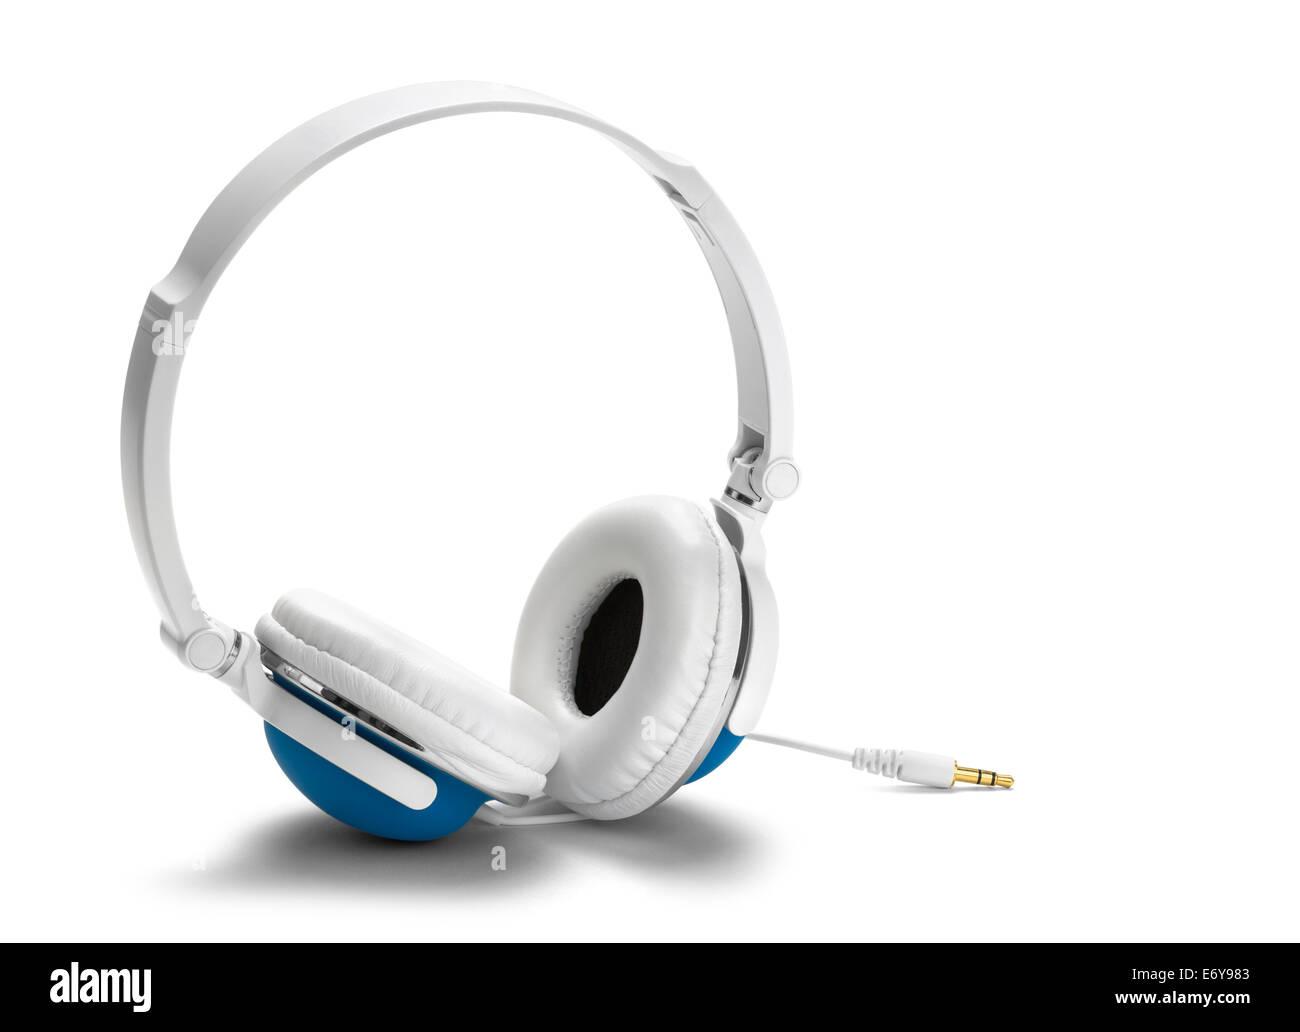 Large Blue and White Headphones Isolated on White Background. - Stock Image